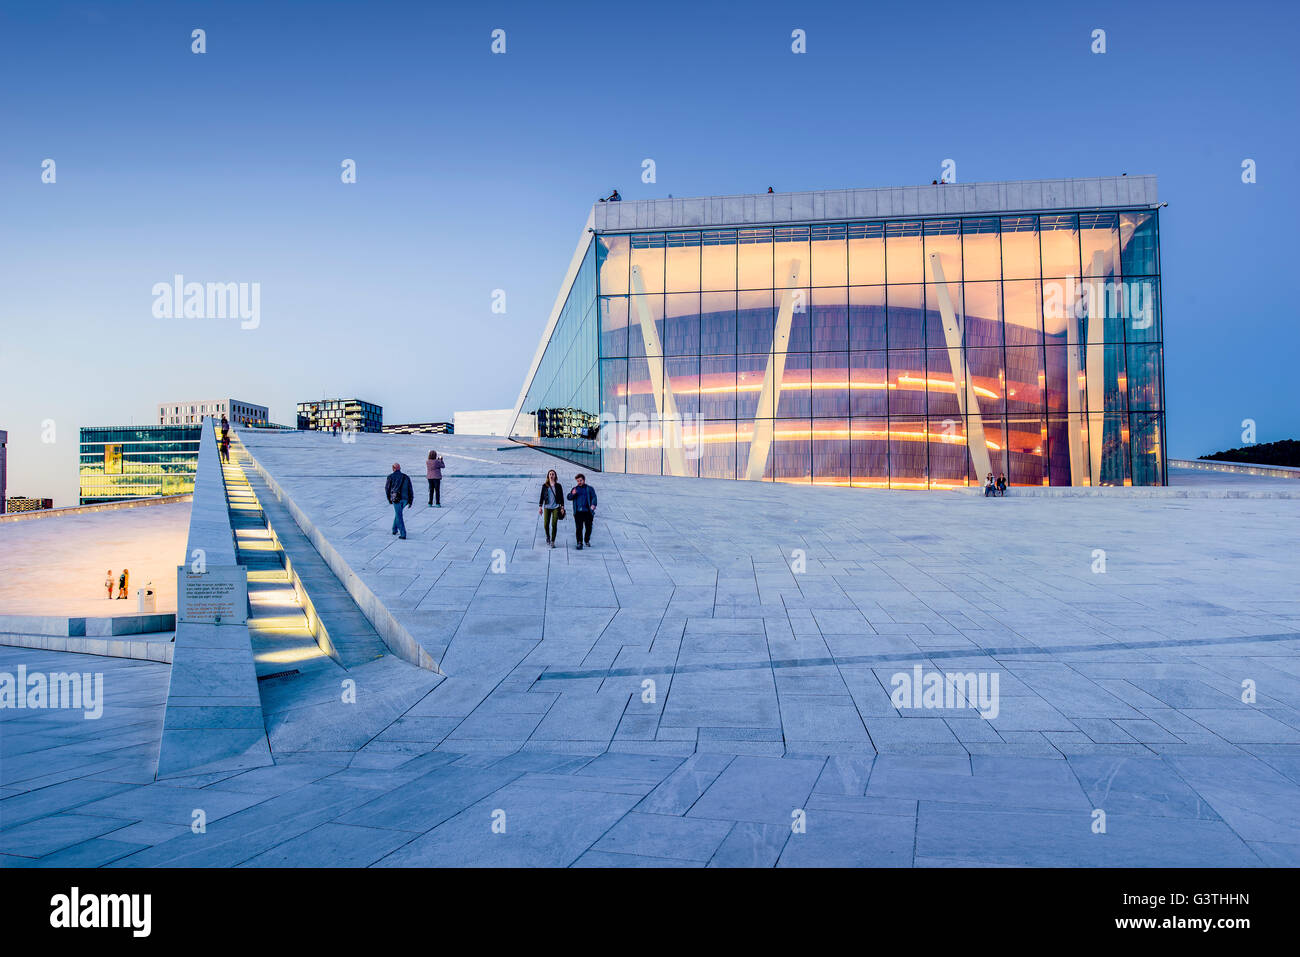 Norway, Oslo, Bjorvika, Operahuset at sunset - Stock Image